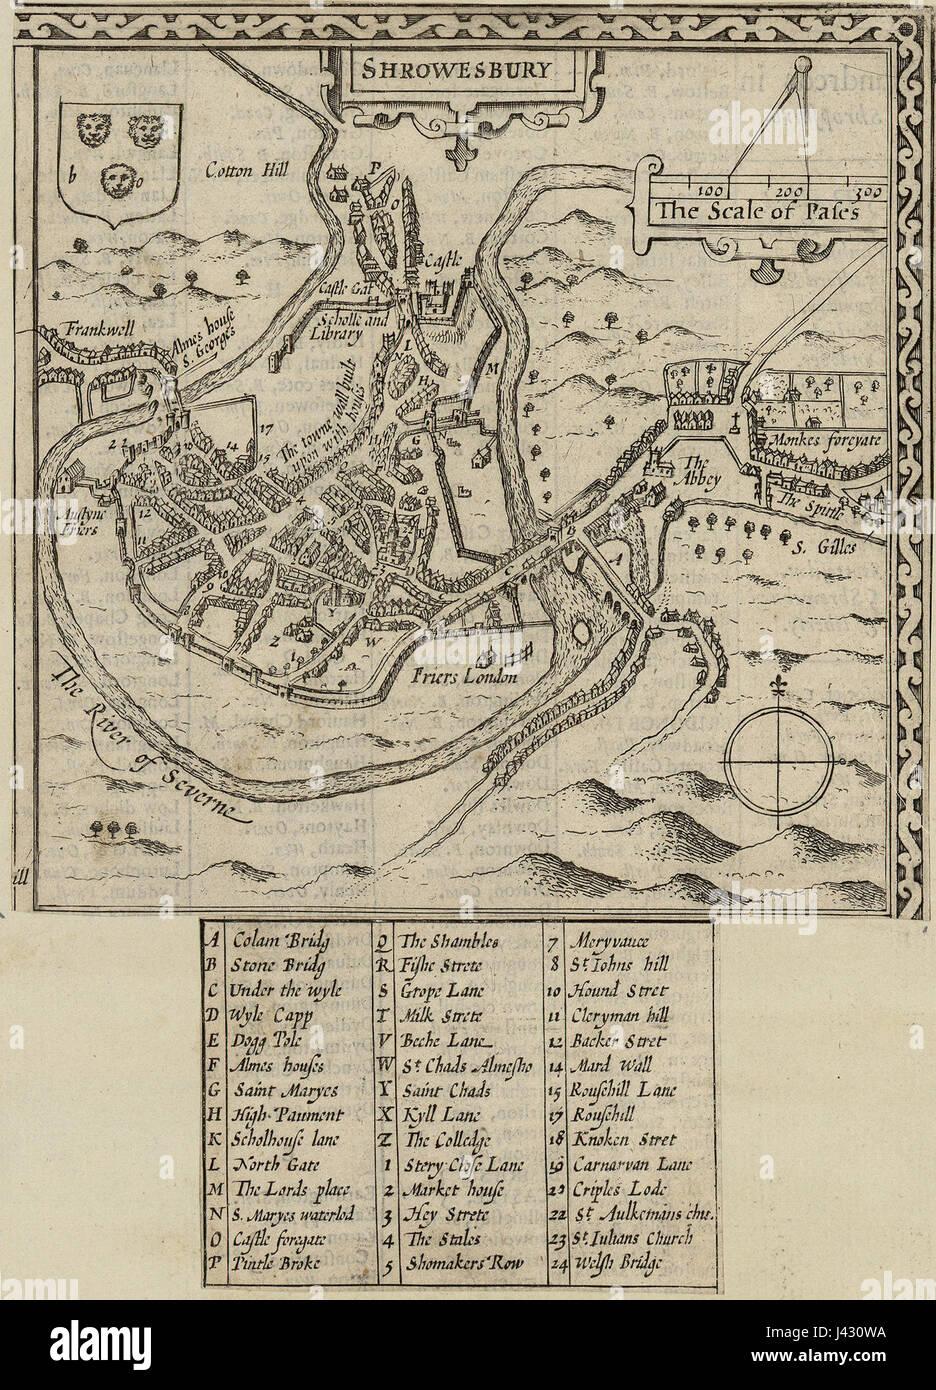 Map of Shrewsbury town 01946 Stock Photo: 140208134 - Alamy